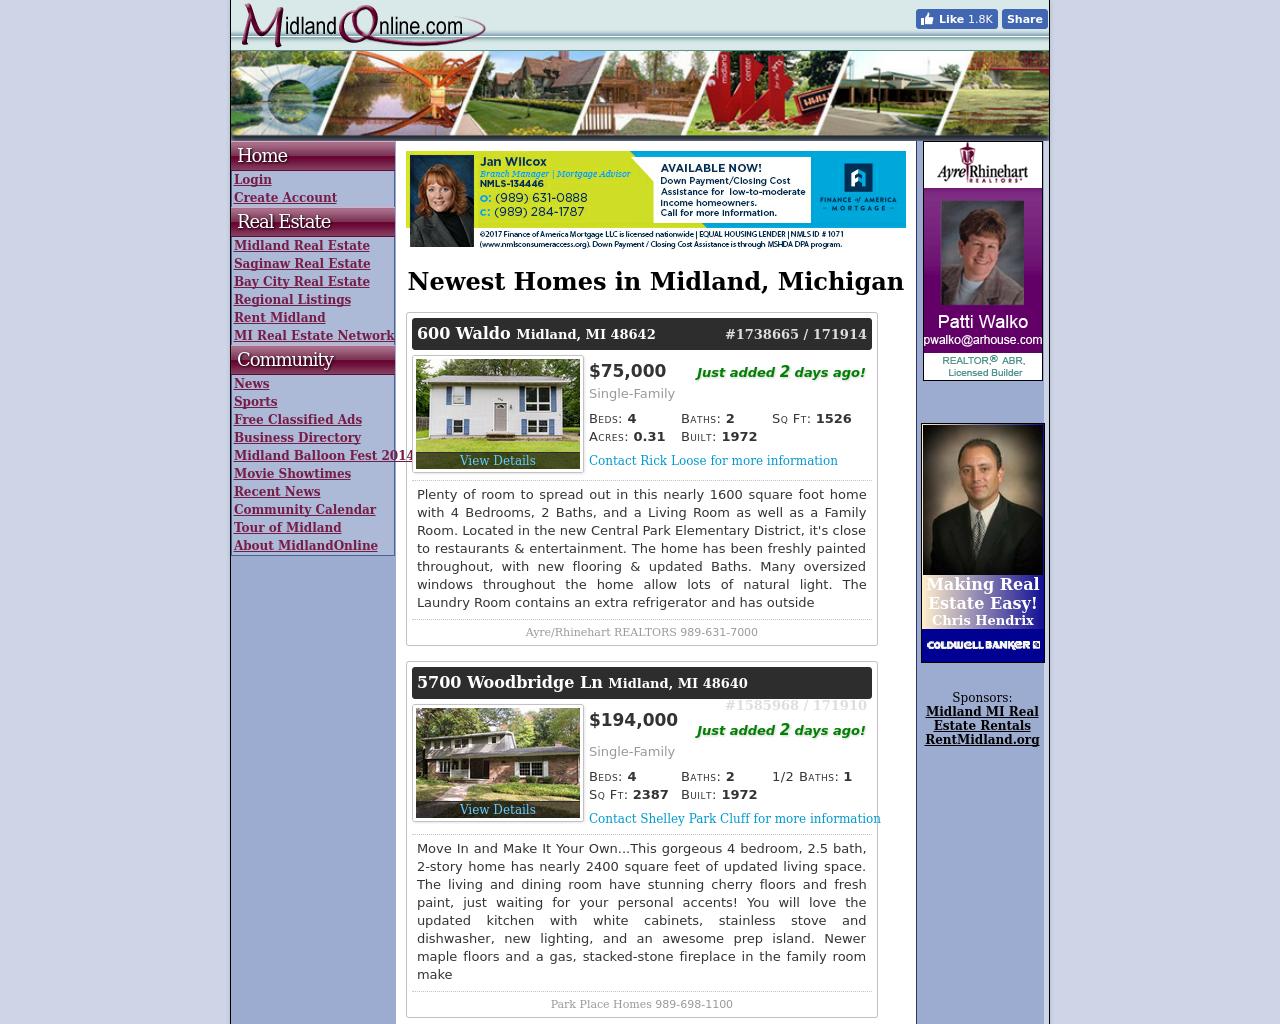 MidlandOnline.com-Advertising-Reviews-Pricing